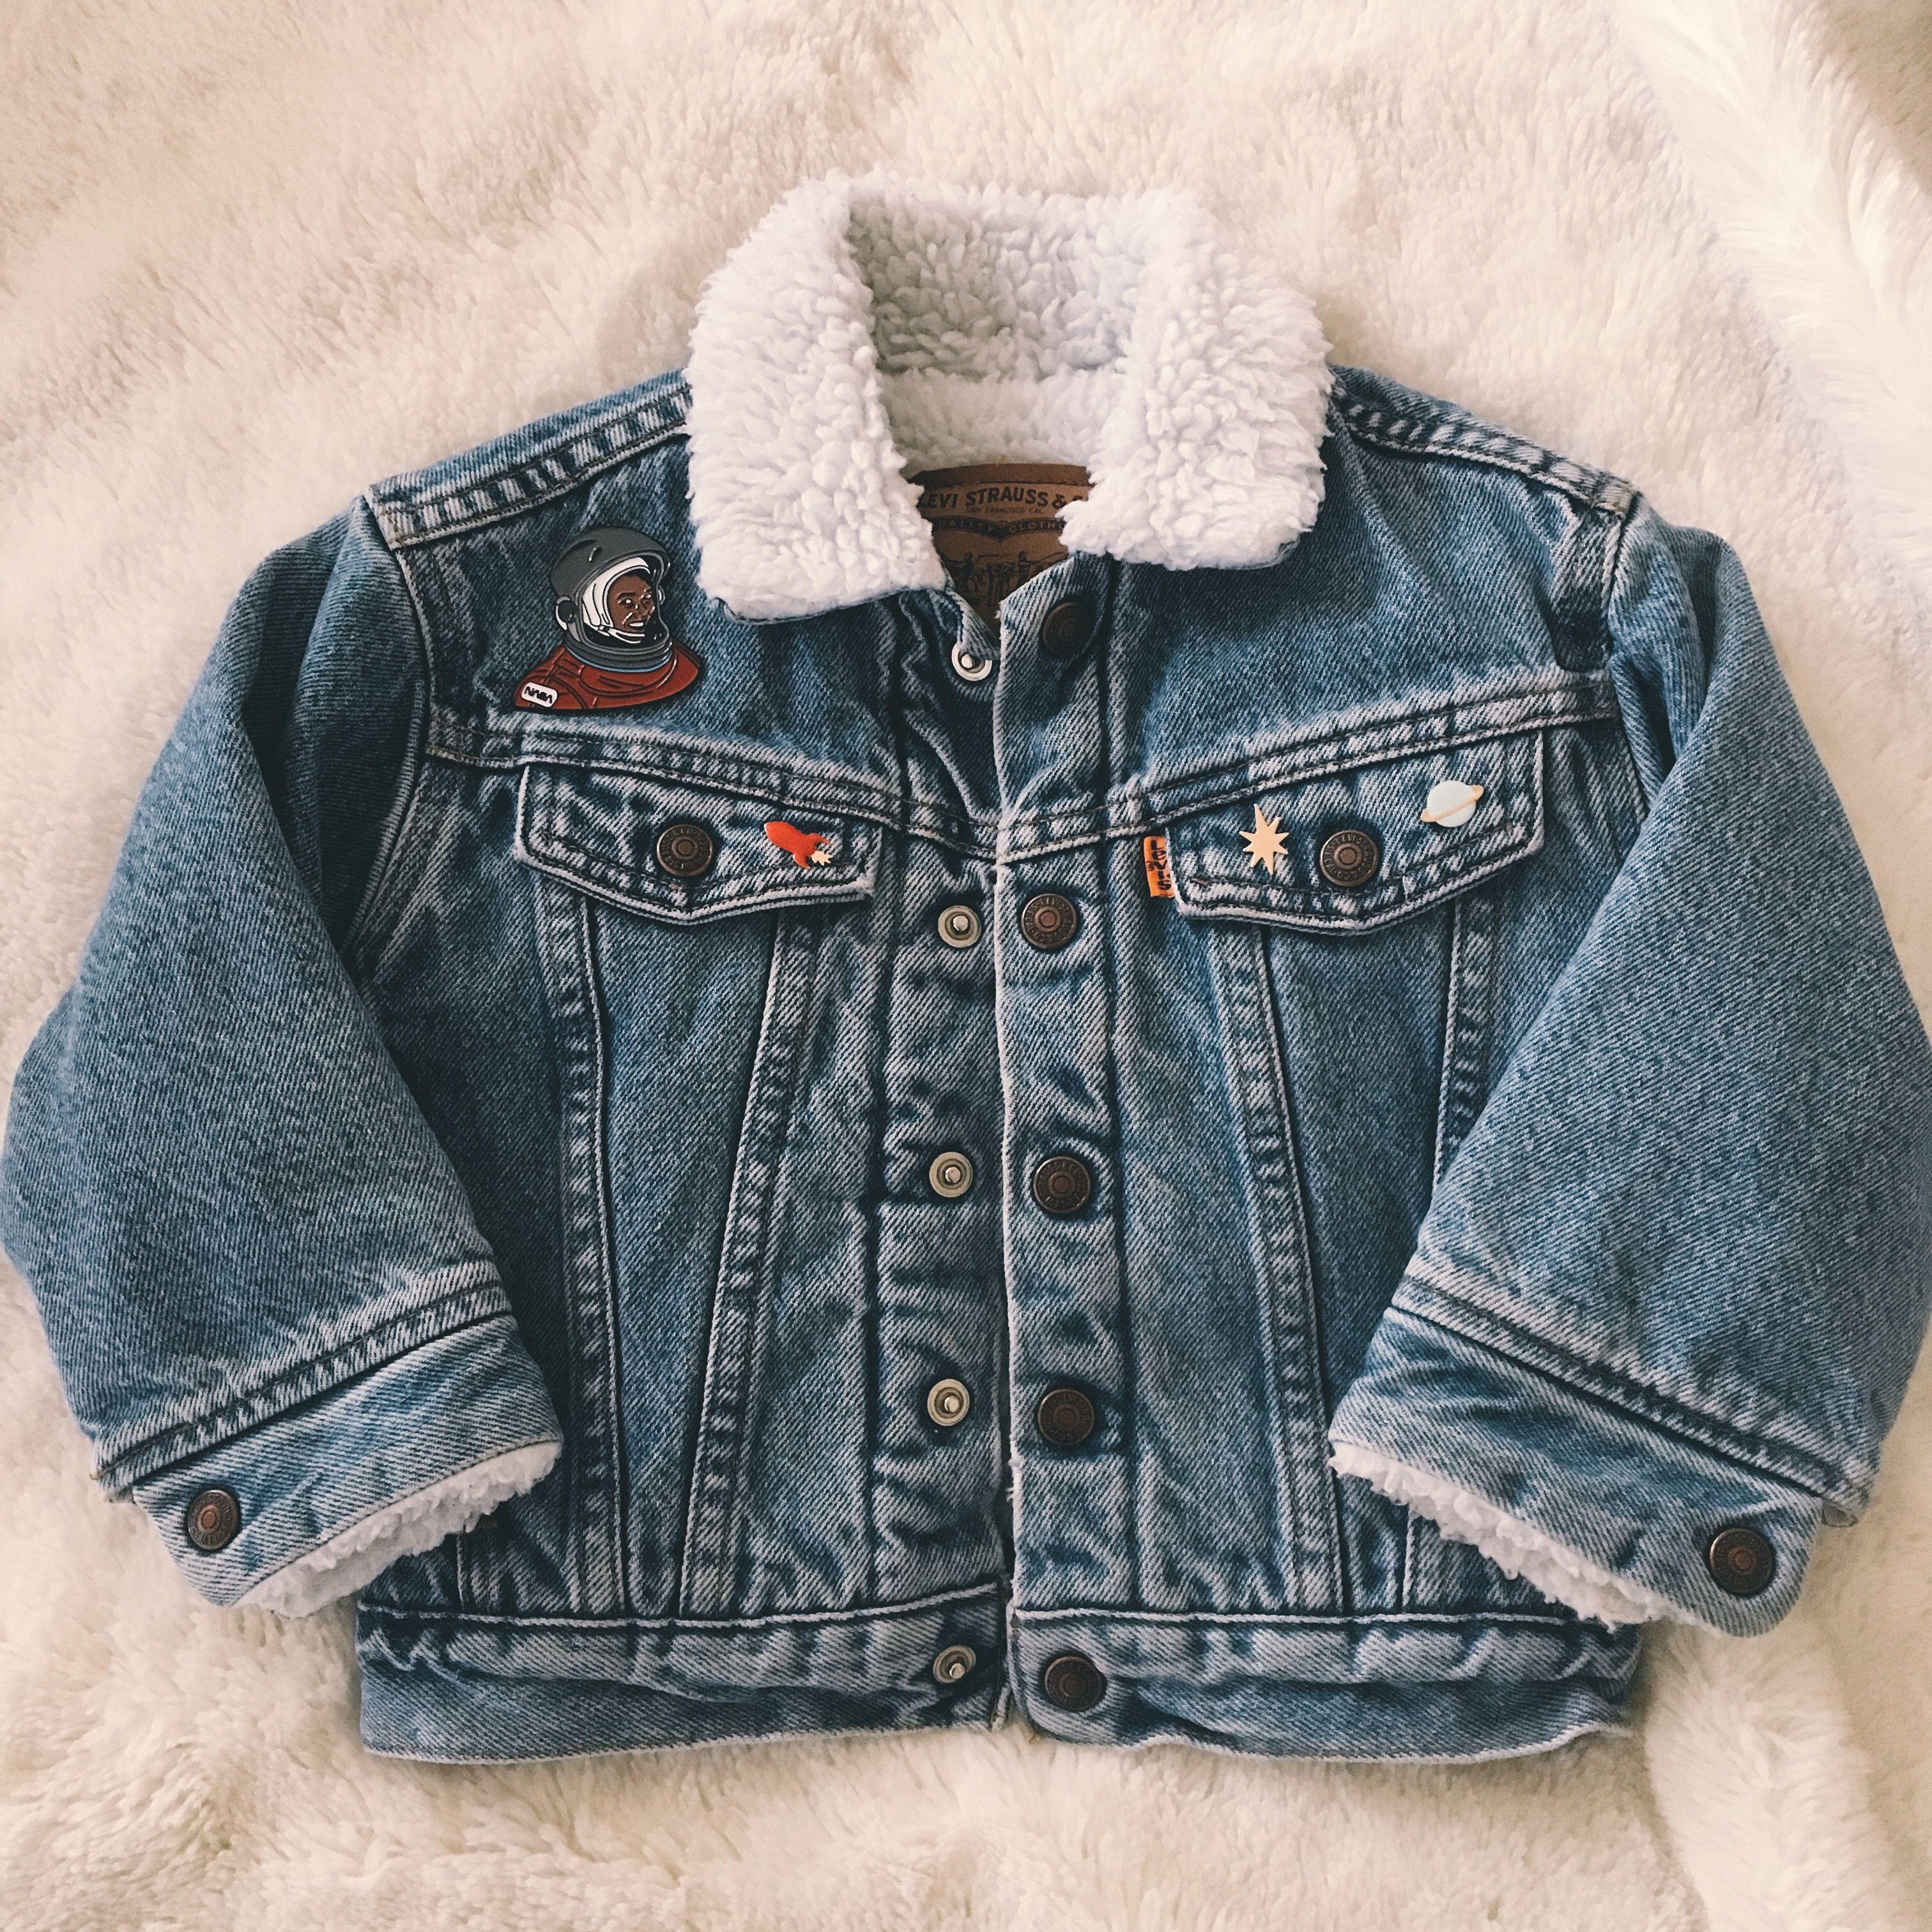 Vintage Toddler Levi S Trucker Jacket With Sherpa Lining Size 3t Levis Sherpa Jacket Baby Jacket Vintage Toddler [ 3024 x 3024 Pixel ]